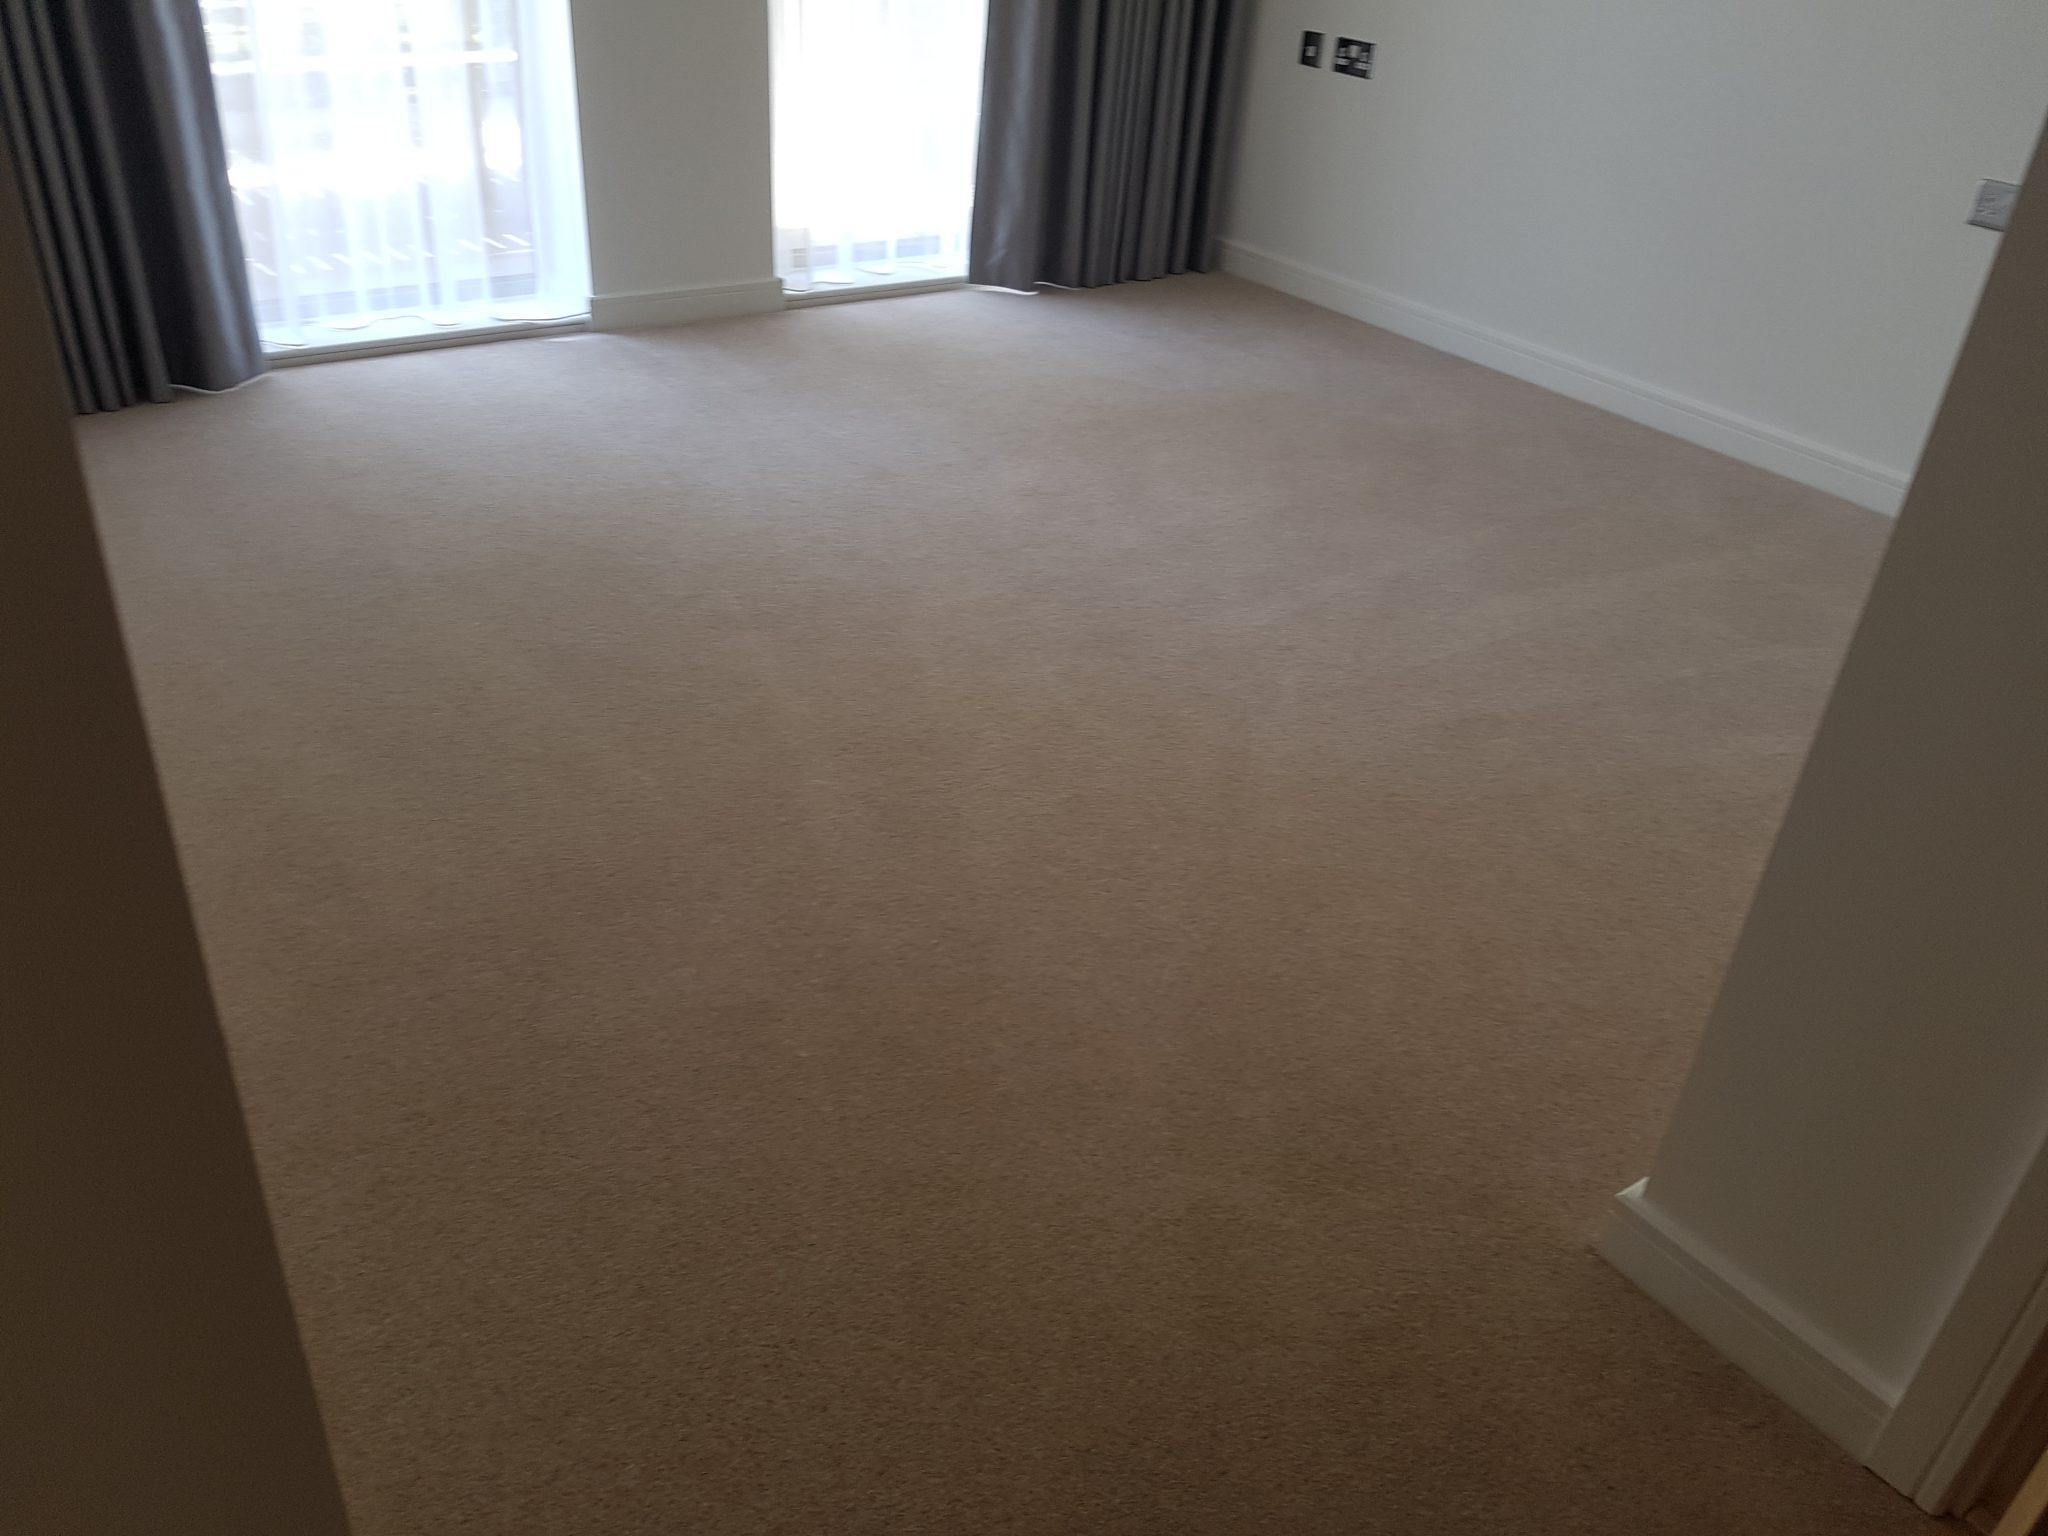 Carpet Cleaning In Crofton Park Lewisham Se4 Postcode